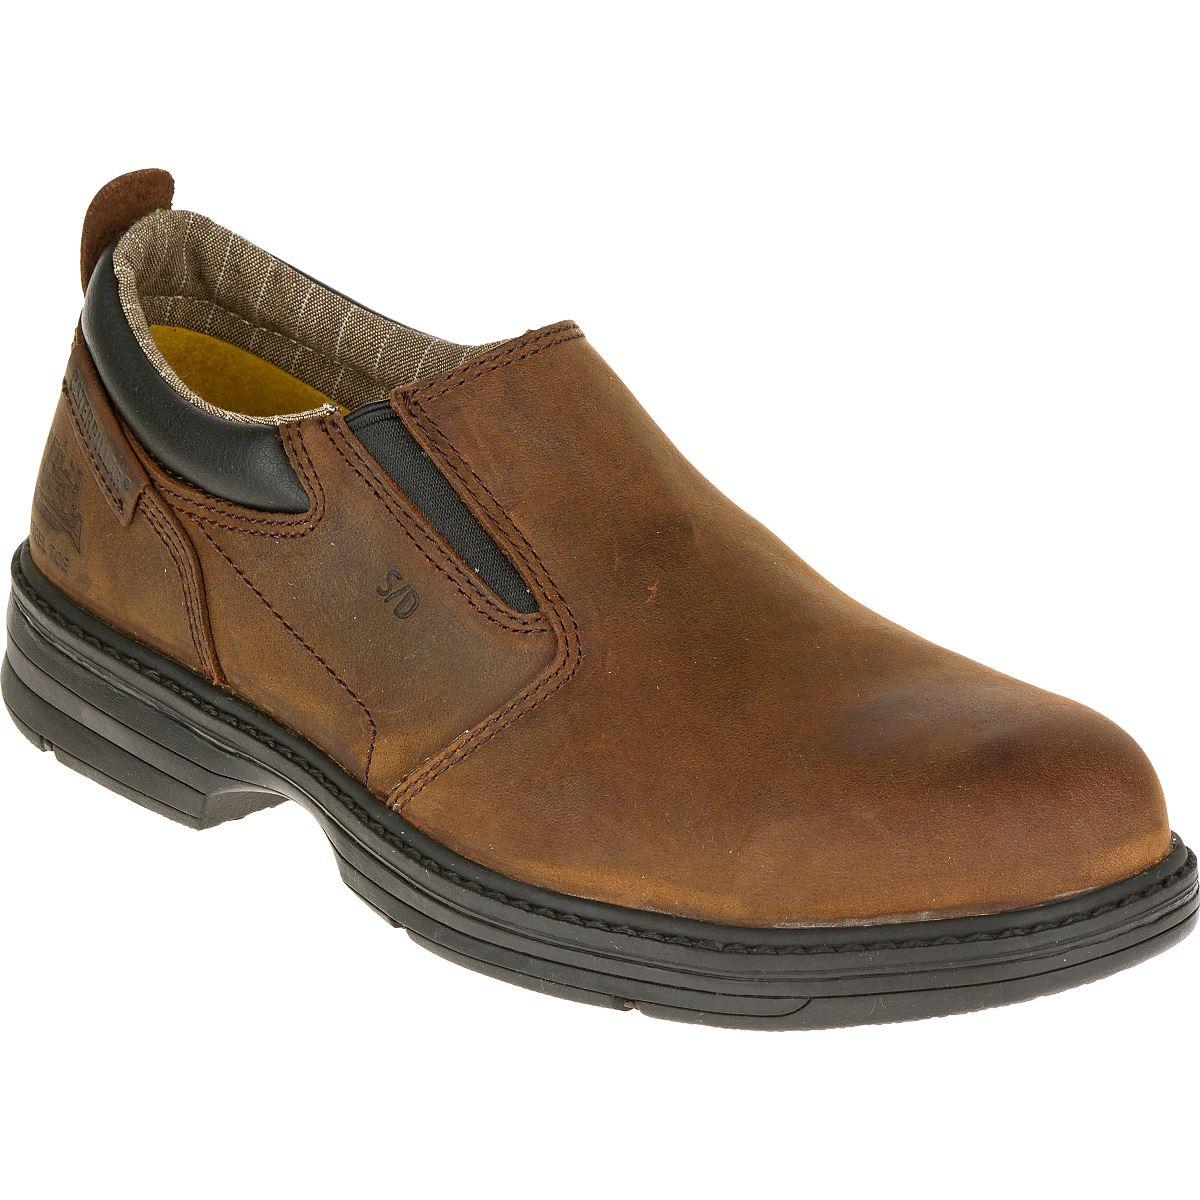 Caterpillar Shoes Ebay